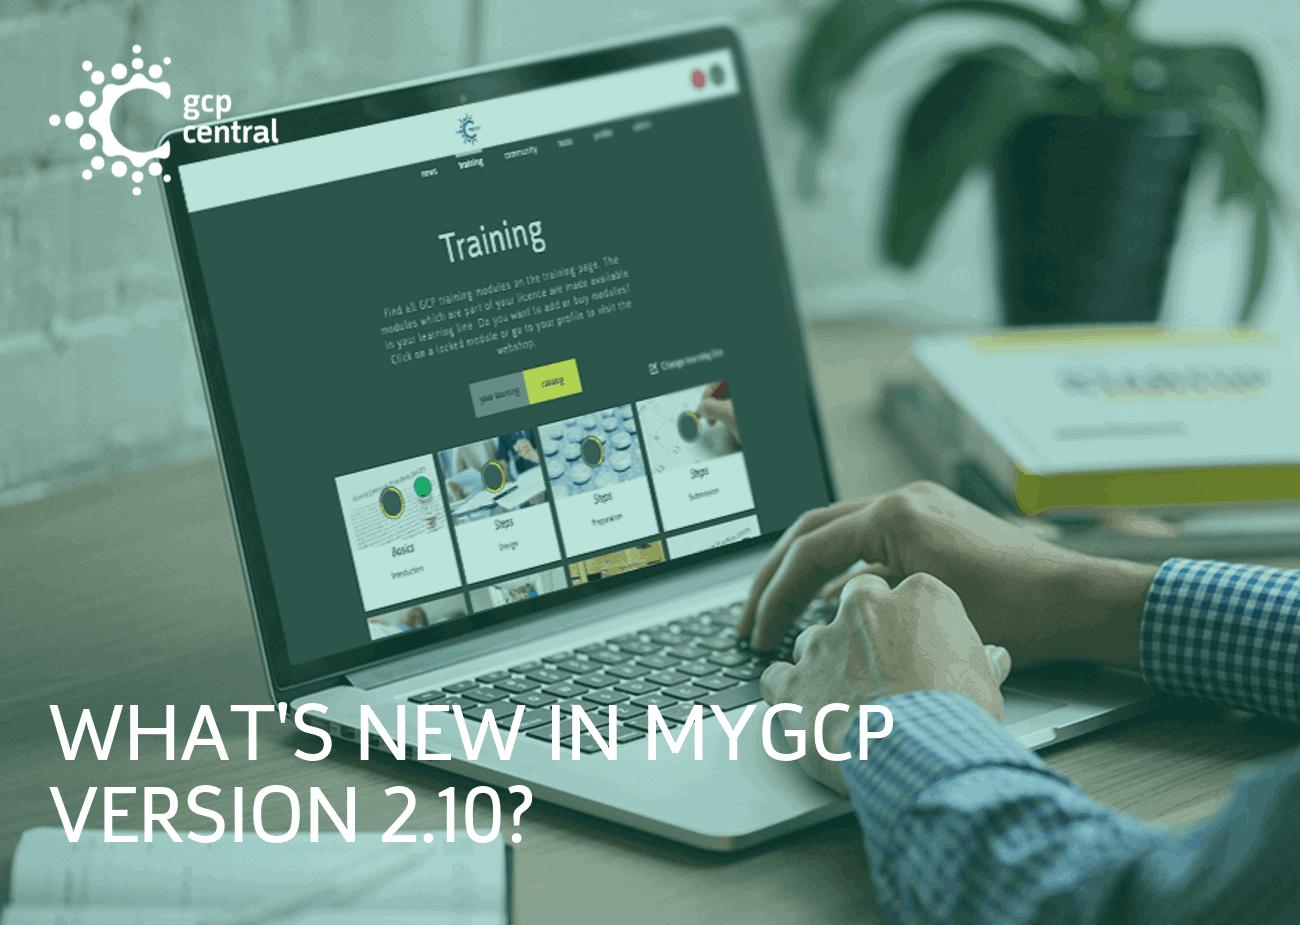 MYGCP GCPCENTRAL